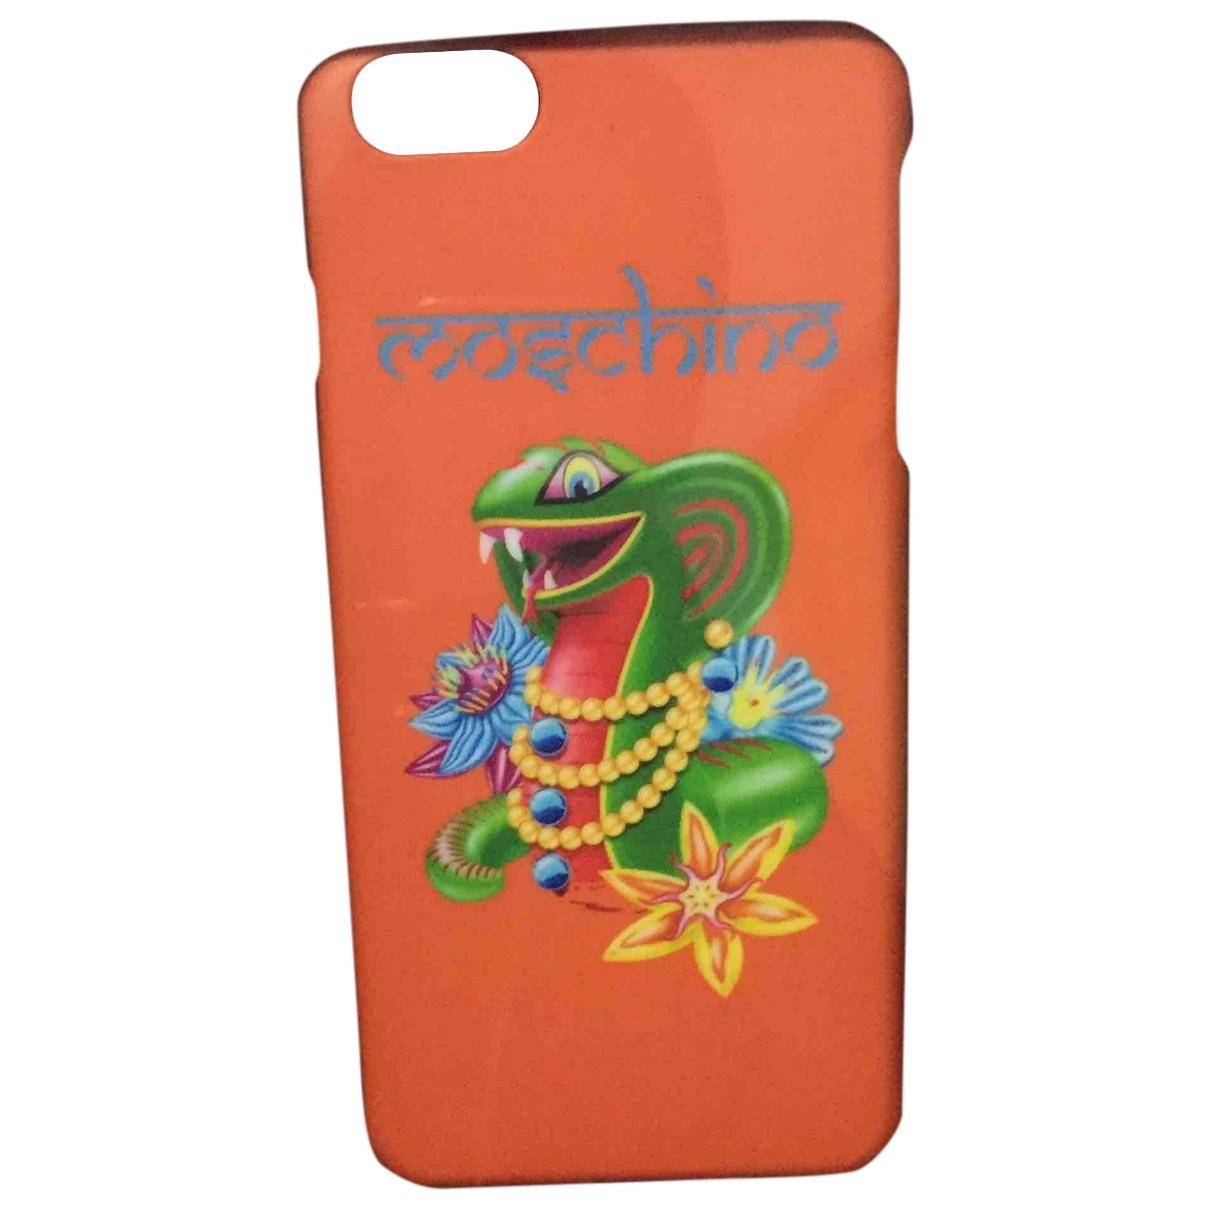 Moschino - Accessoires   pour lifestyle - orange